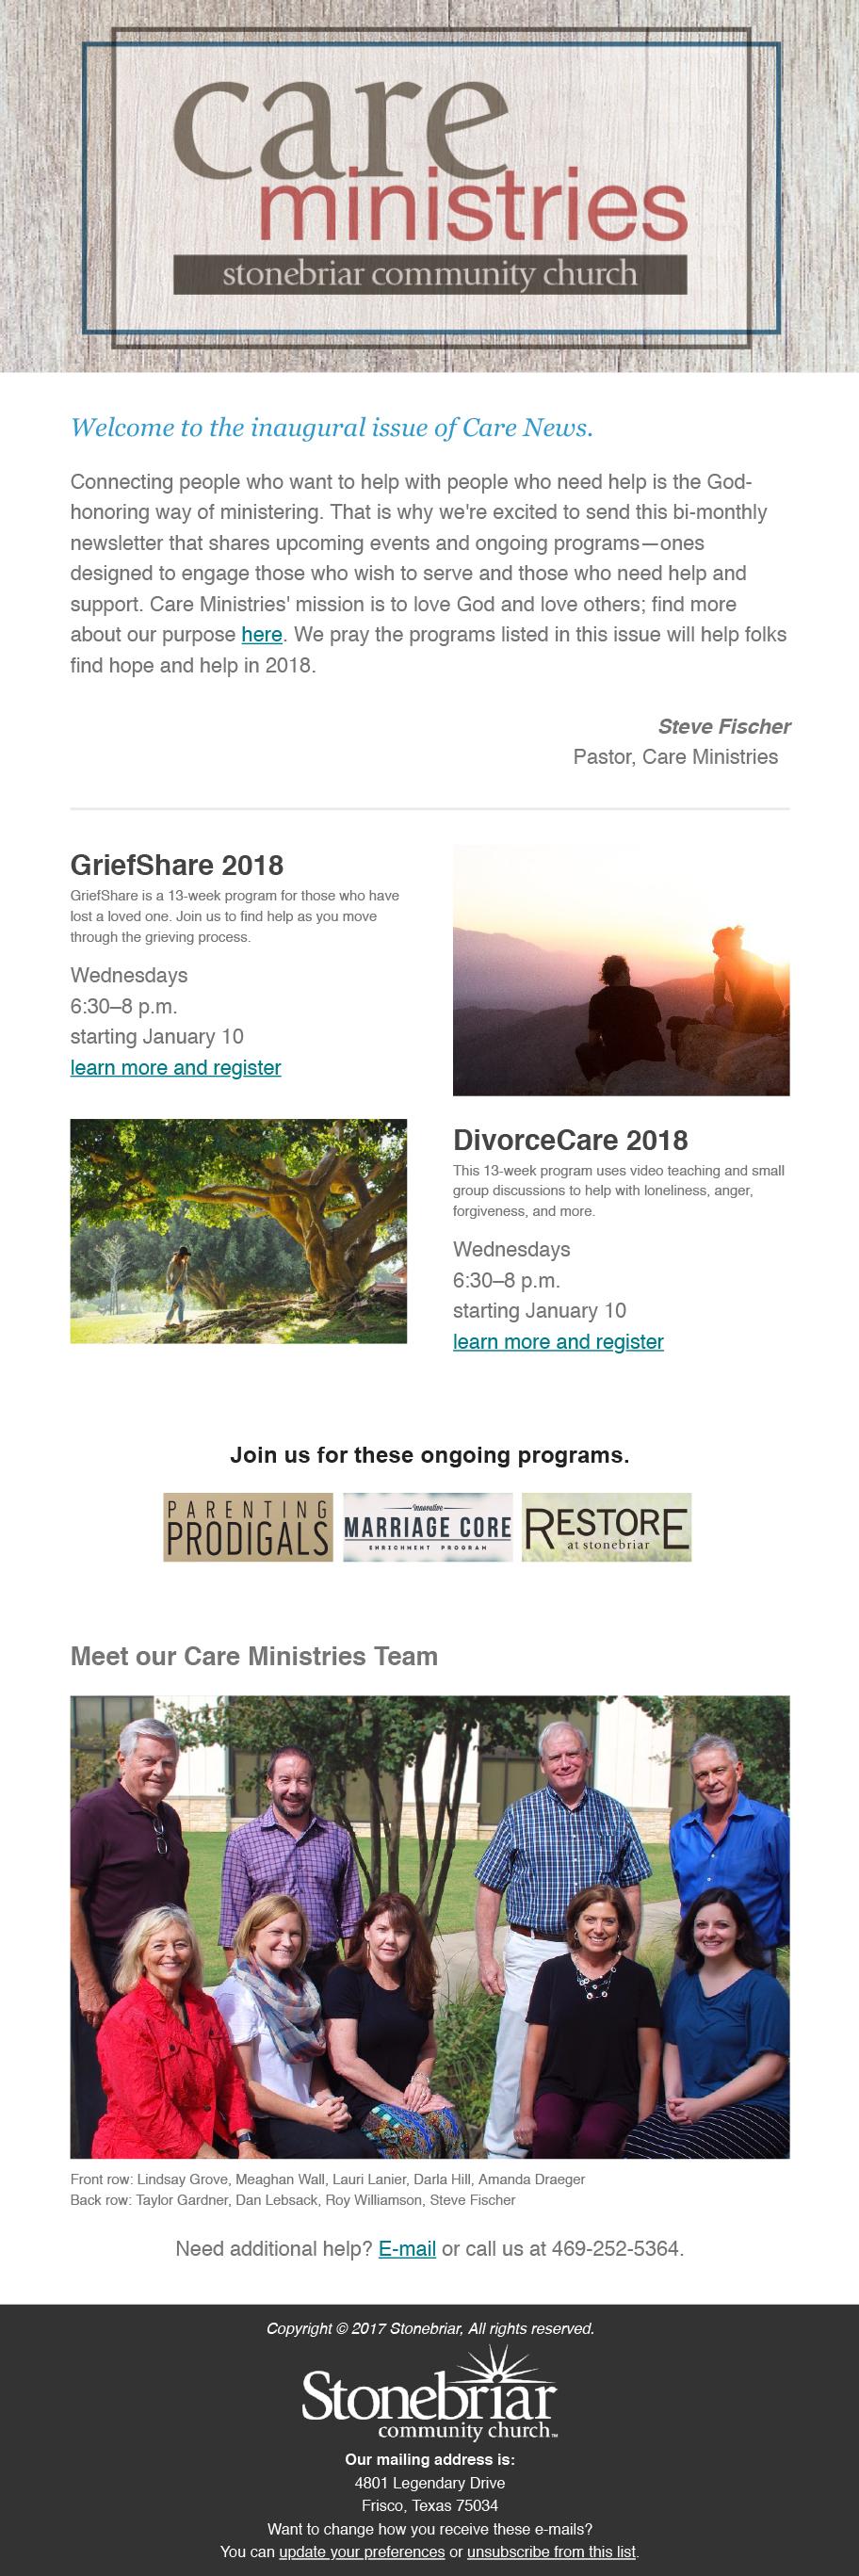 MailchimpTemplate-_Care-News2